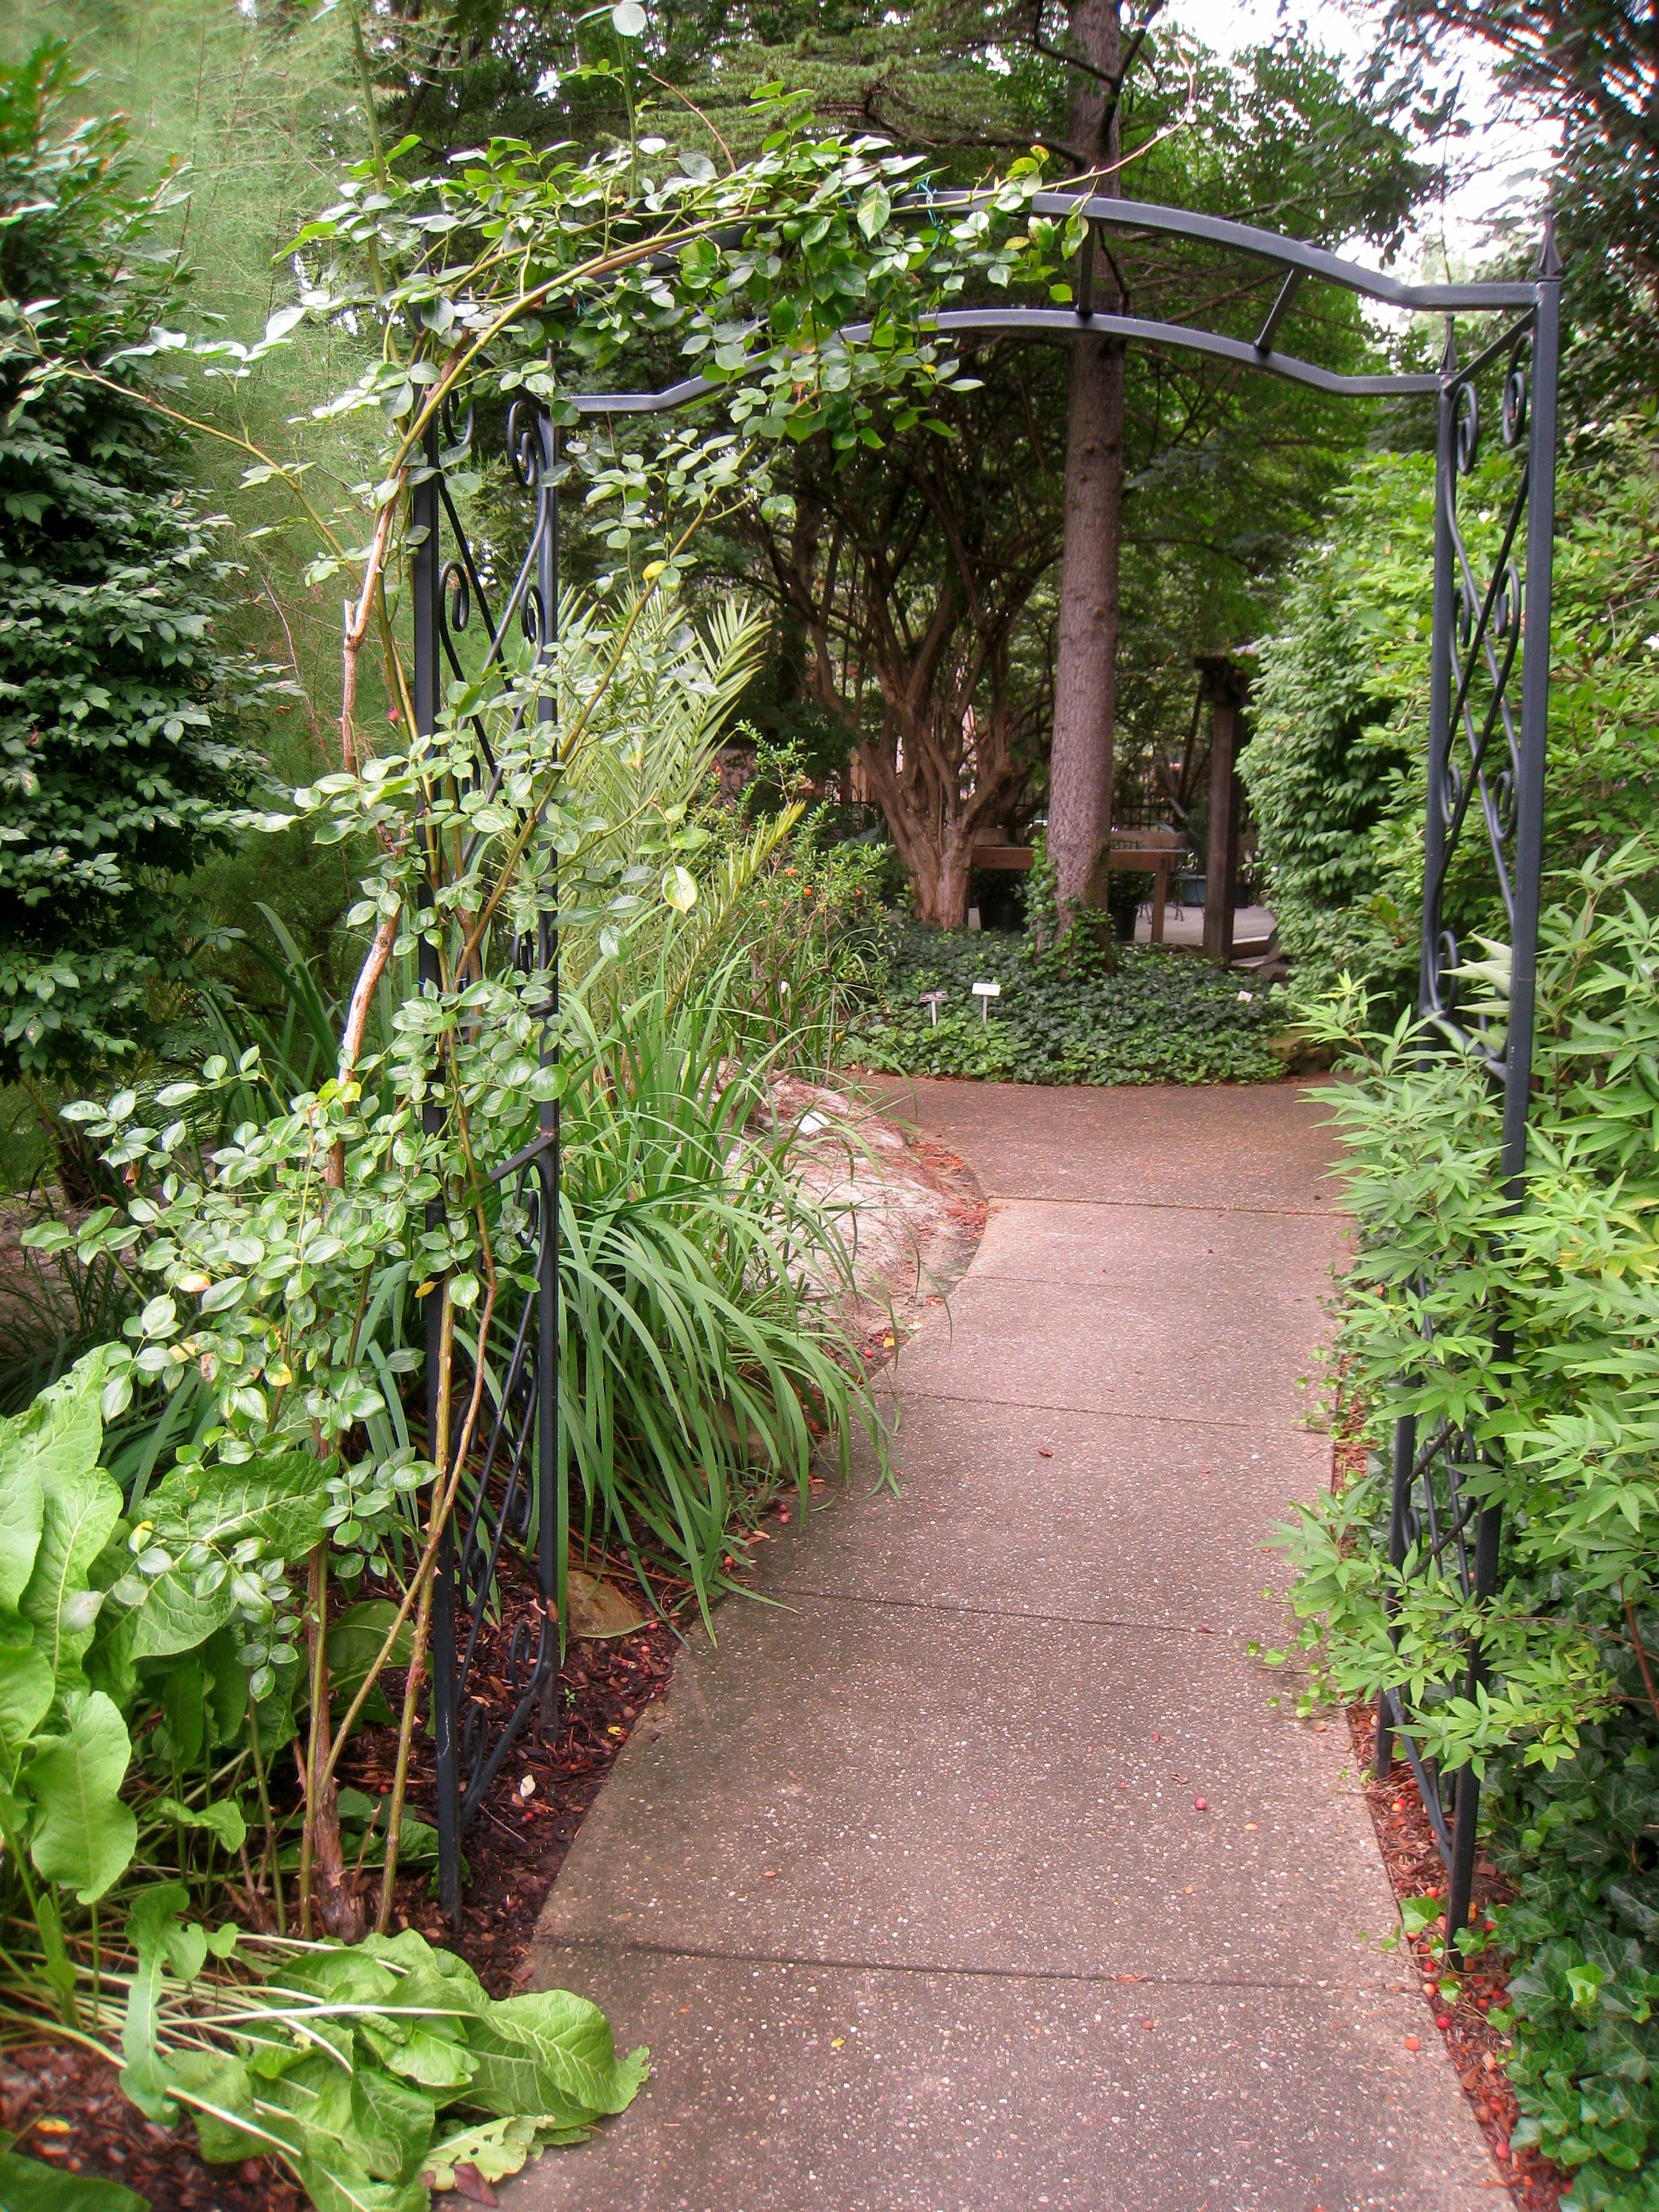 About Us Rodef Shalom Biblical Botanical Garden